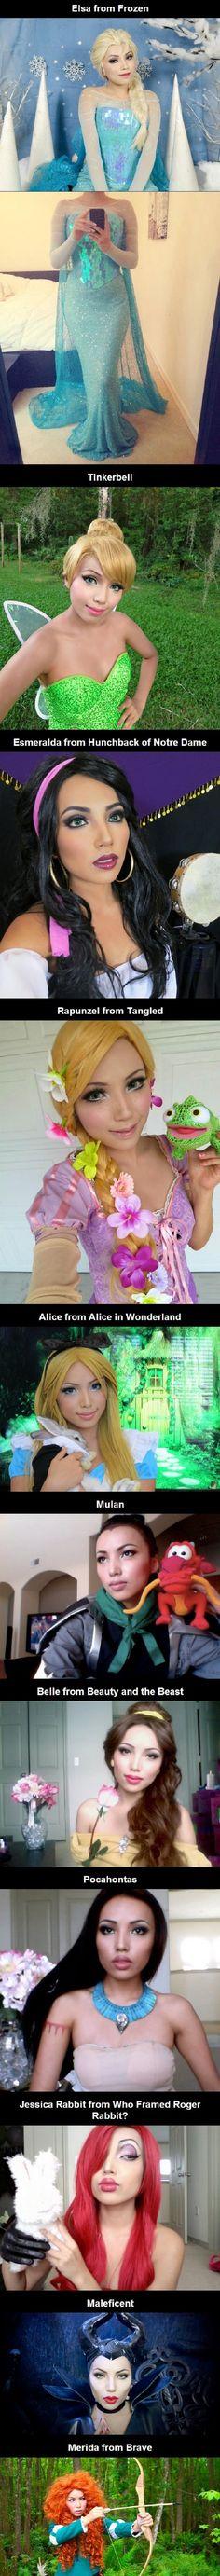 Disney cosplays